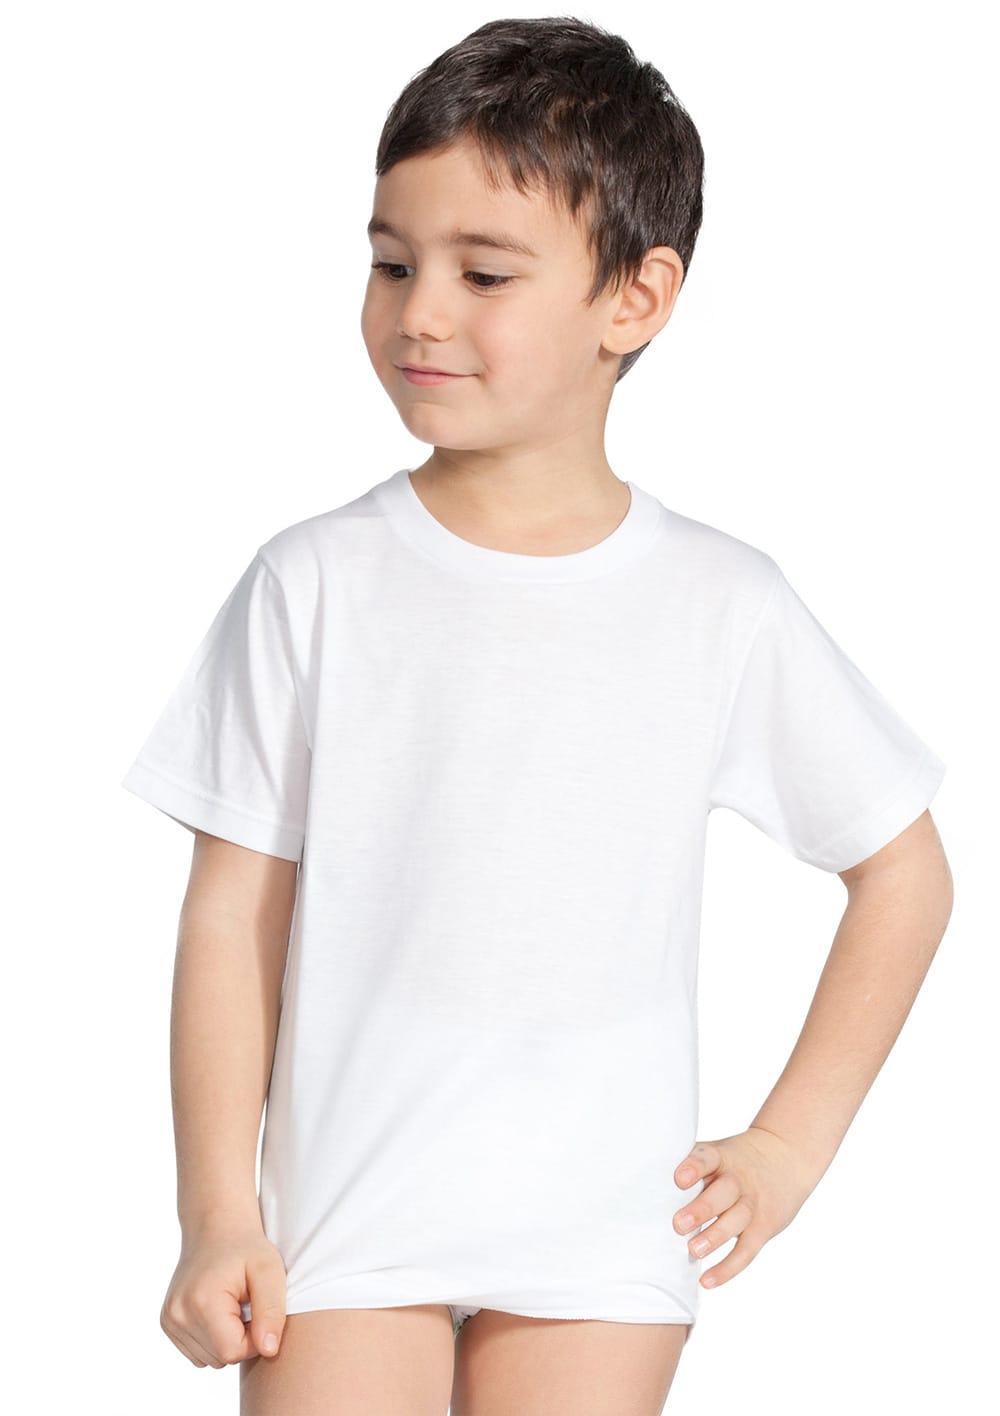 T Shirt Manica Corta In Cotone Jersey